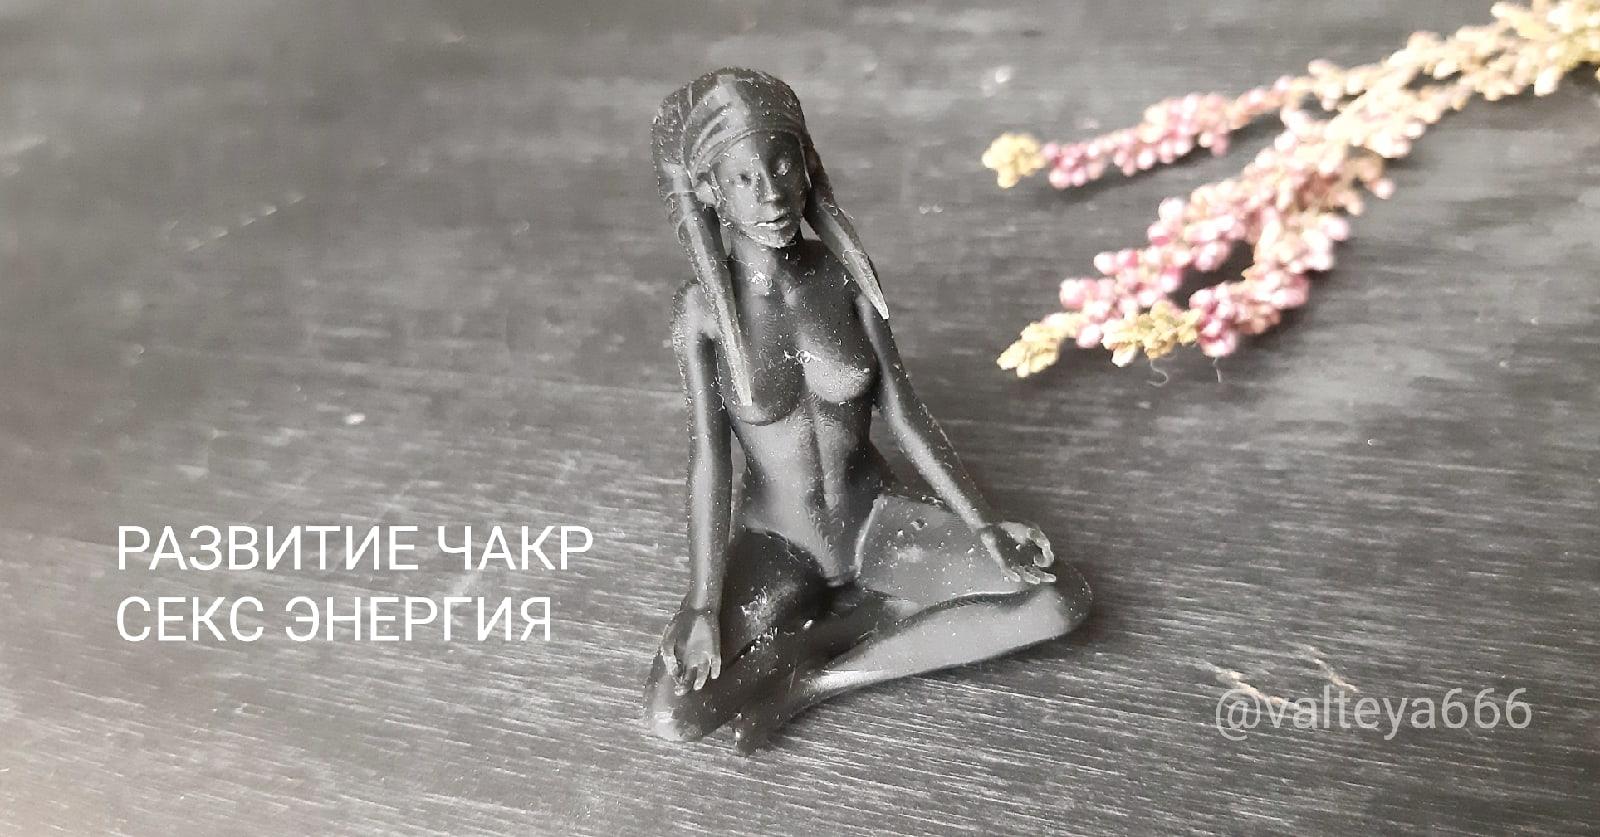 Хештег девушка на   Салон Магии и Мистики Елены Руденко. Киев ,тел: +380506251562 NS_-FxcBq1I